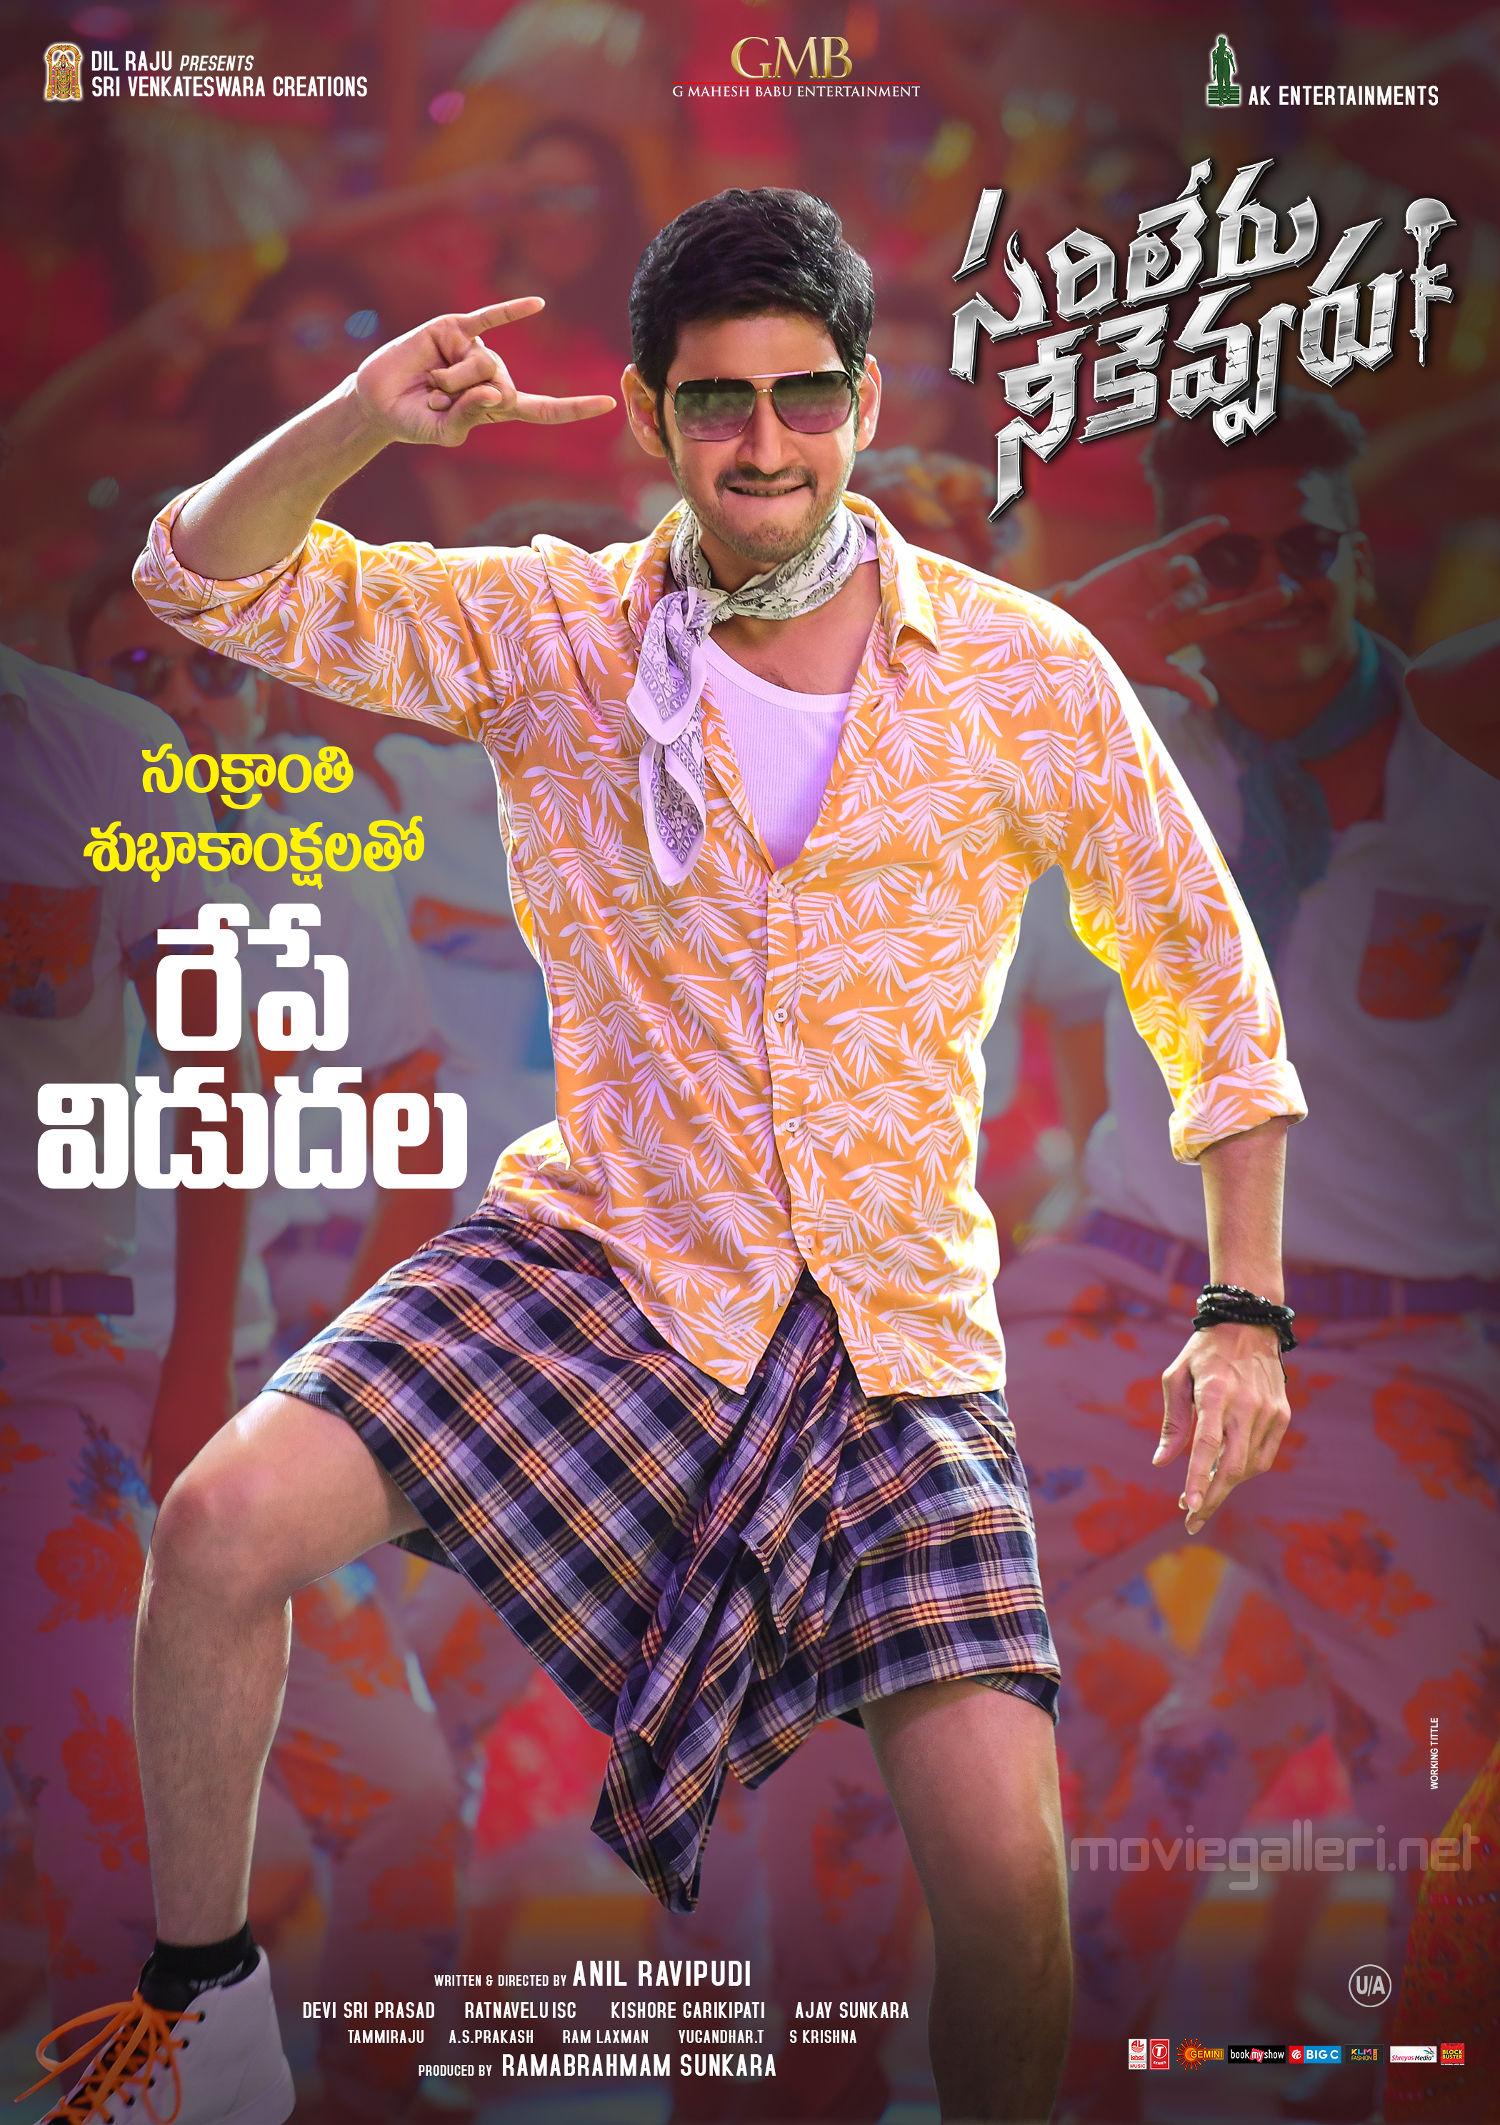 Mahesh Babu Sarileru Neekevvaru Movie Release Tomorrow Posters HD